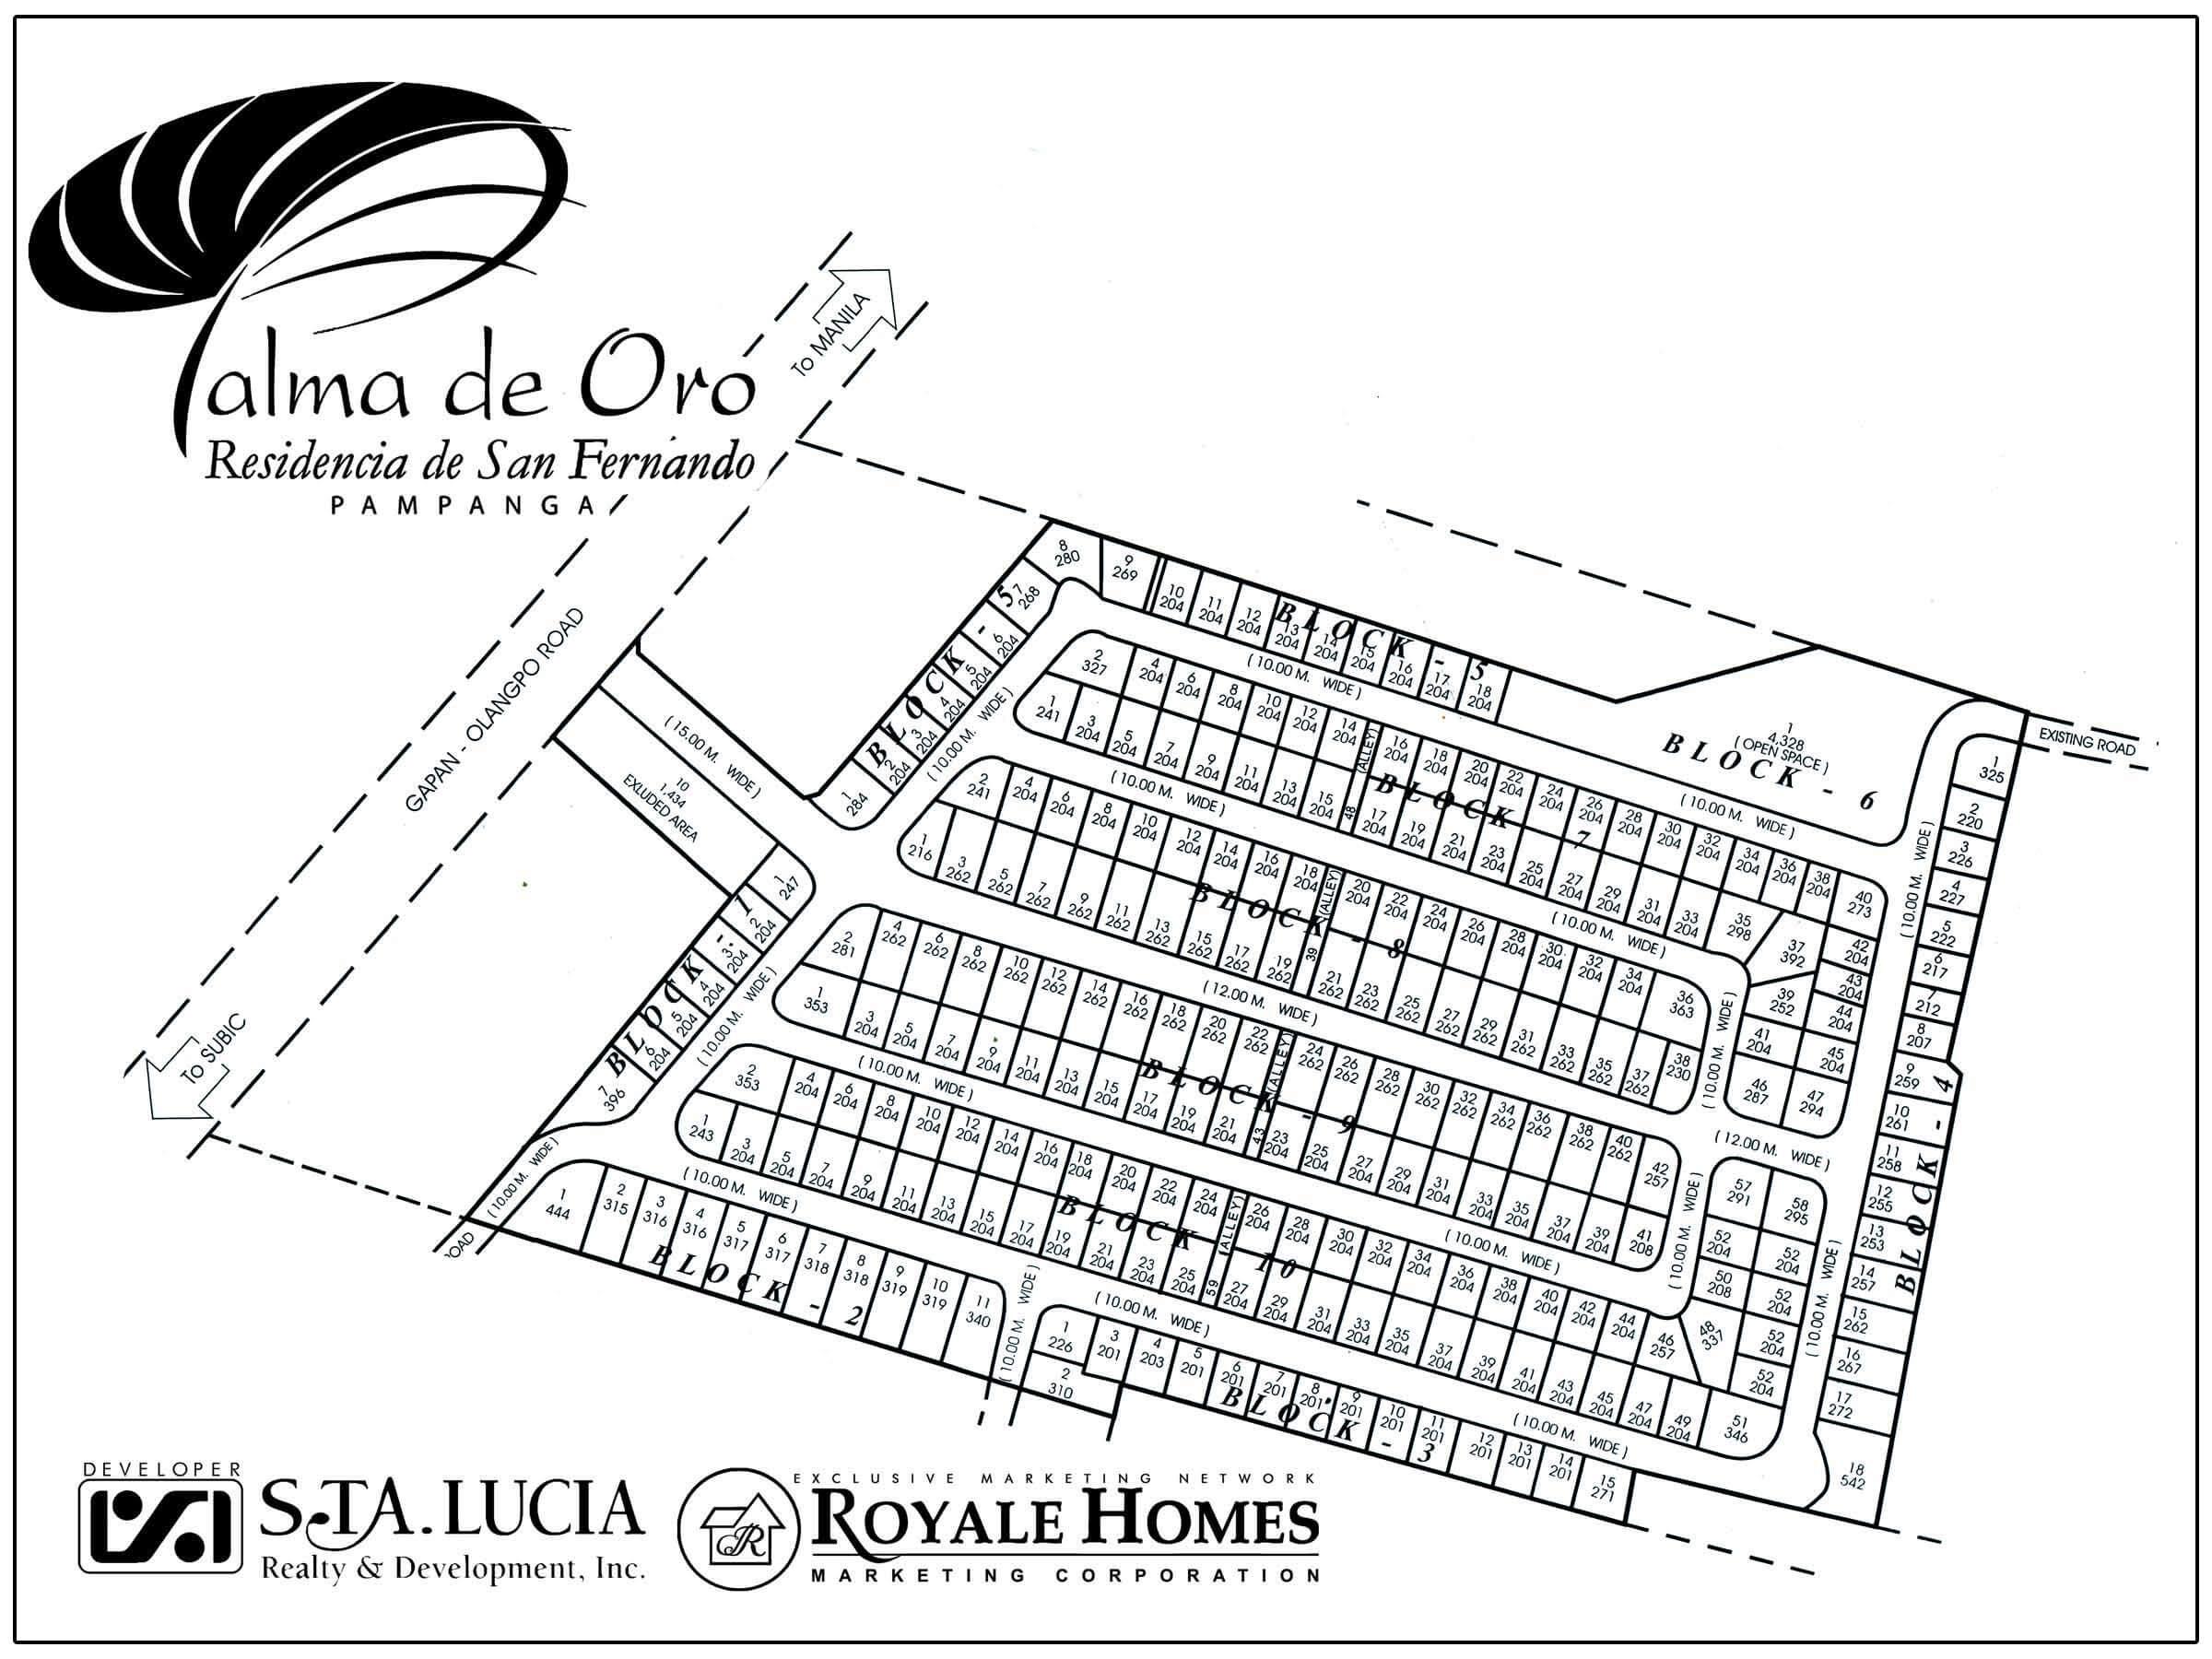 Palma De Oro Royale Homes Marketing Corp